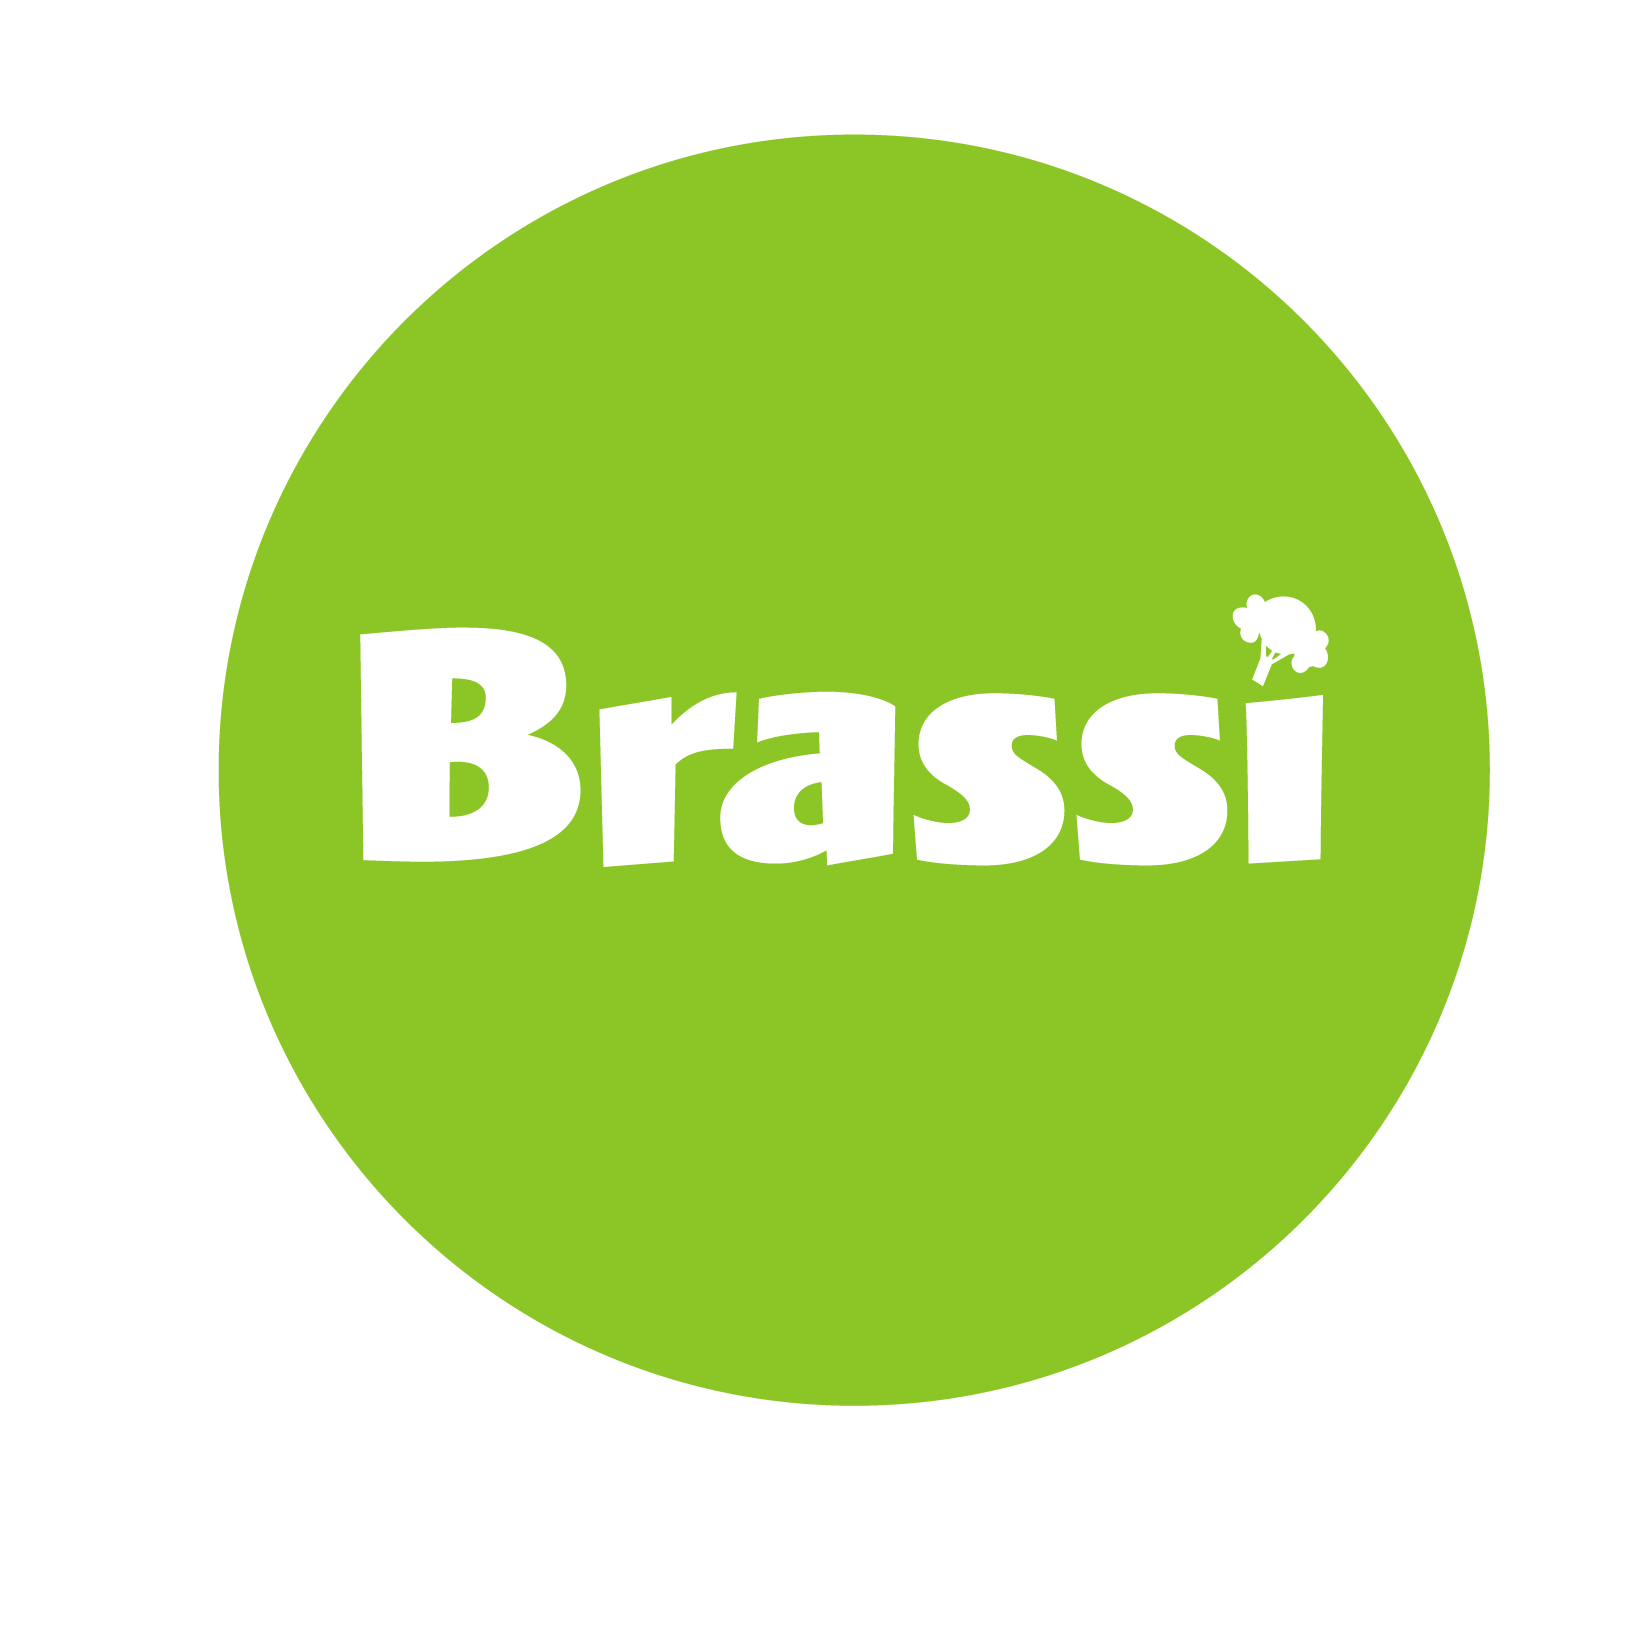 Brassi